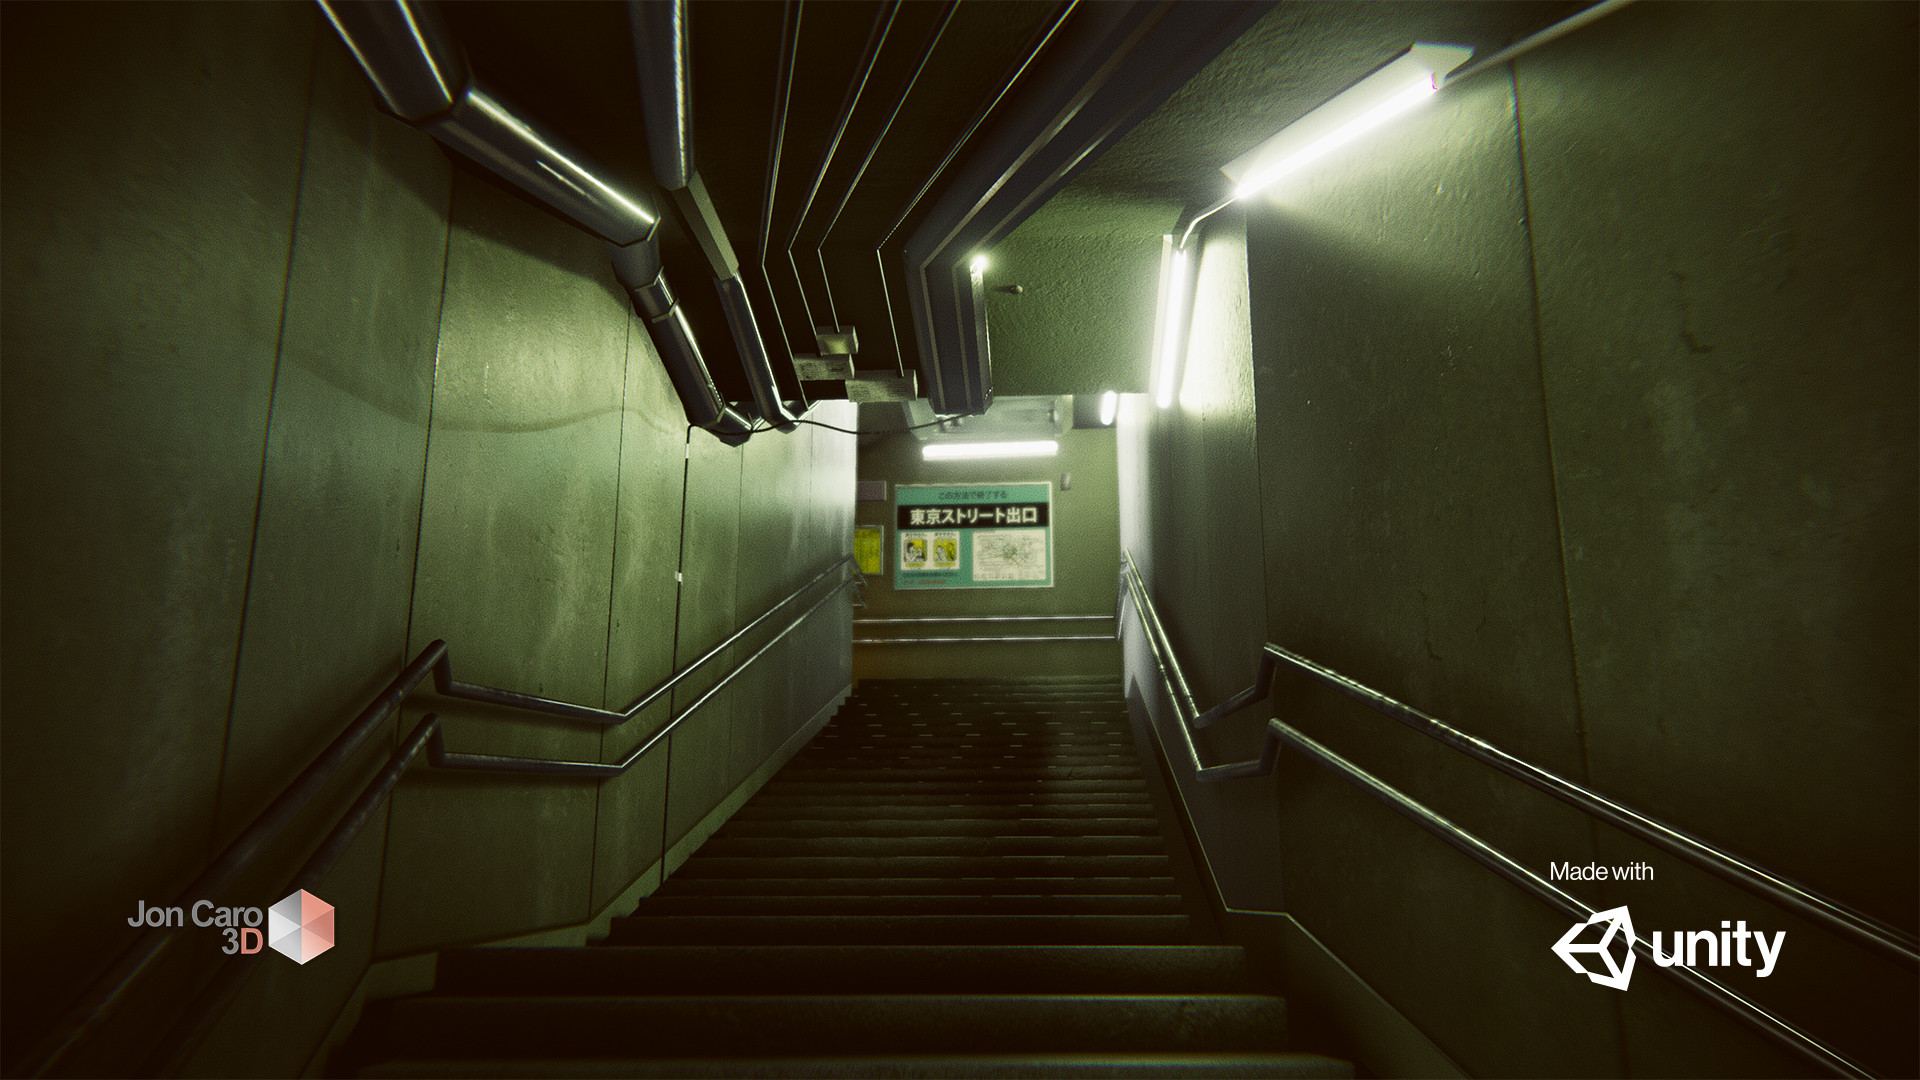 Jonathan caro subwayexitrefjc